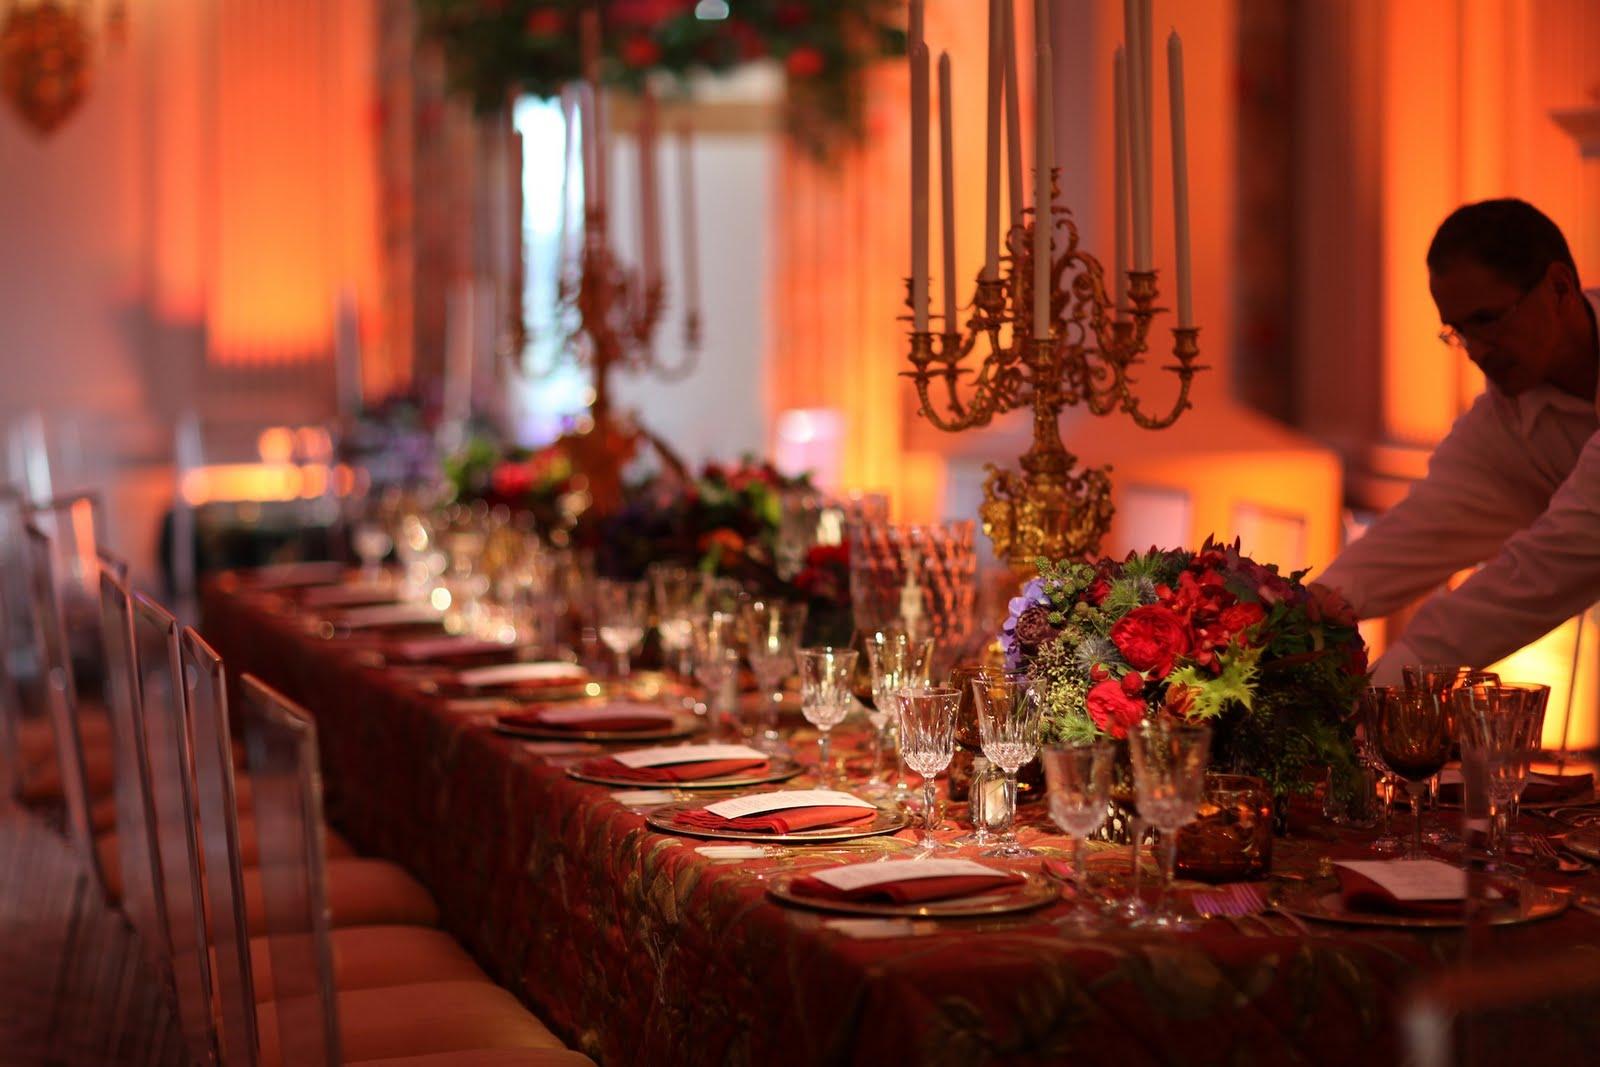 Photo Gallery: 5 Obama Dinner Menus - Food Republic